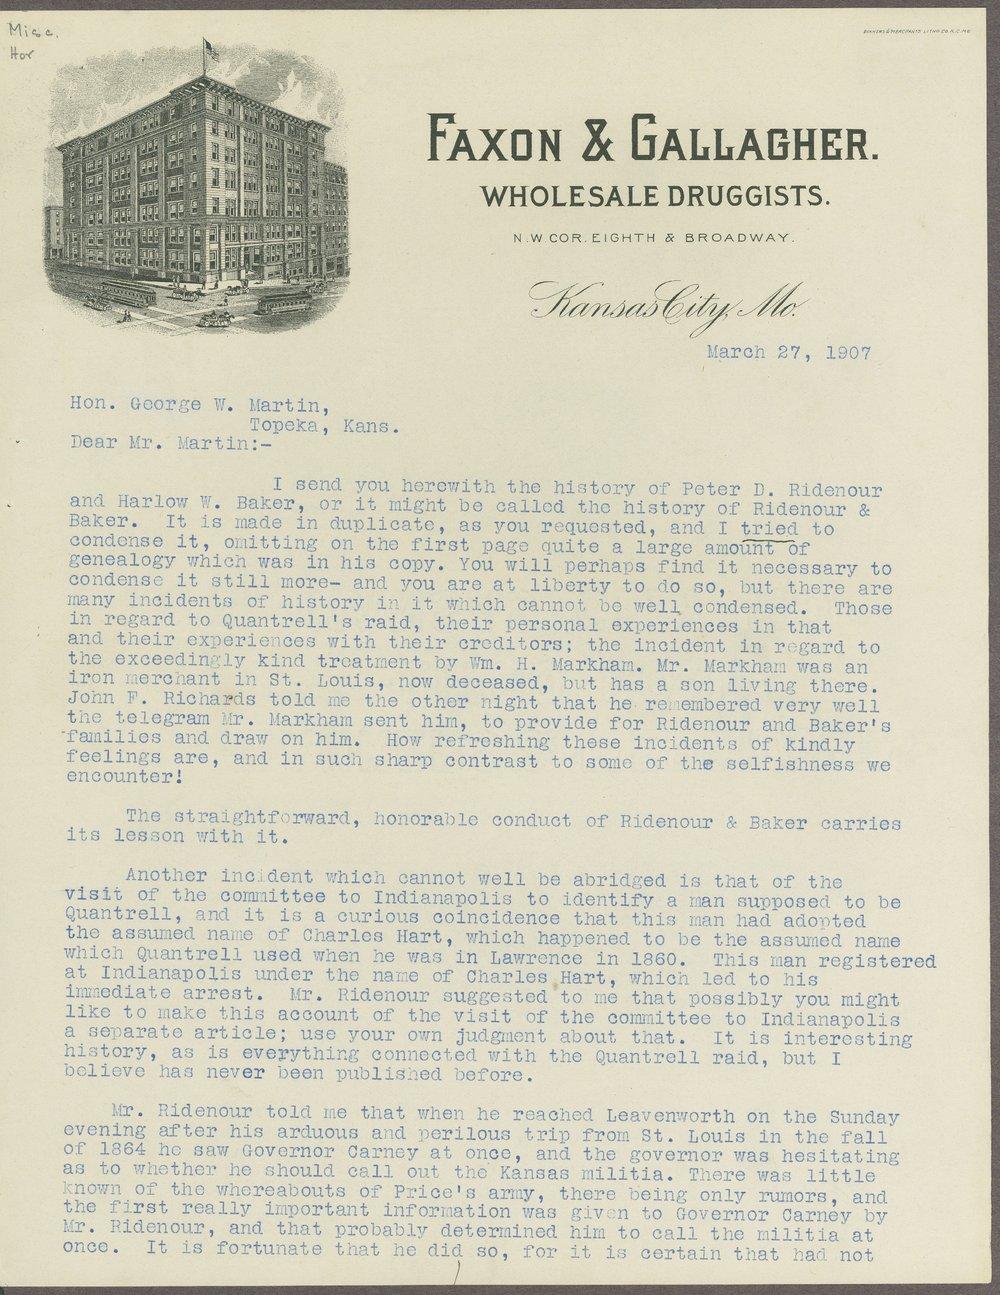 James C. Horton correspondence - 6